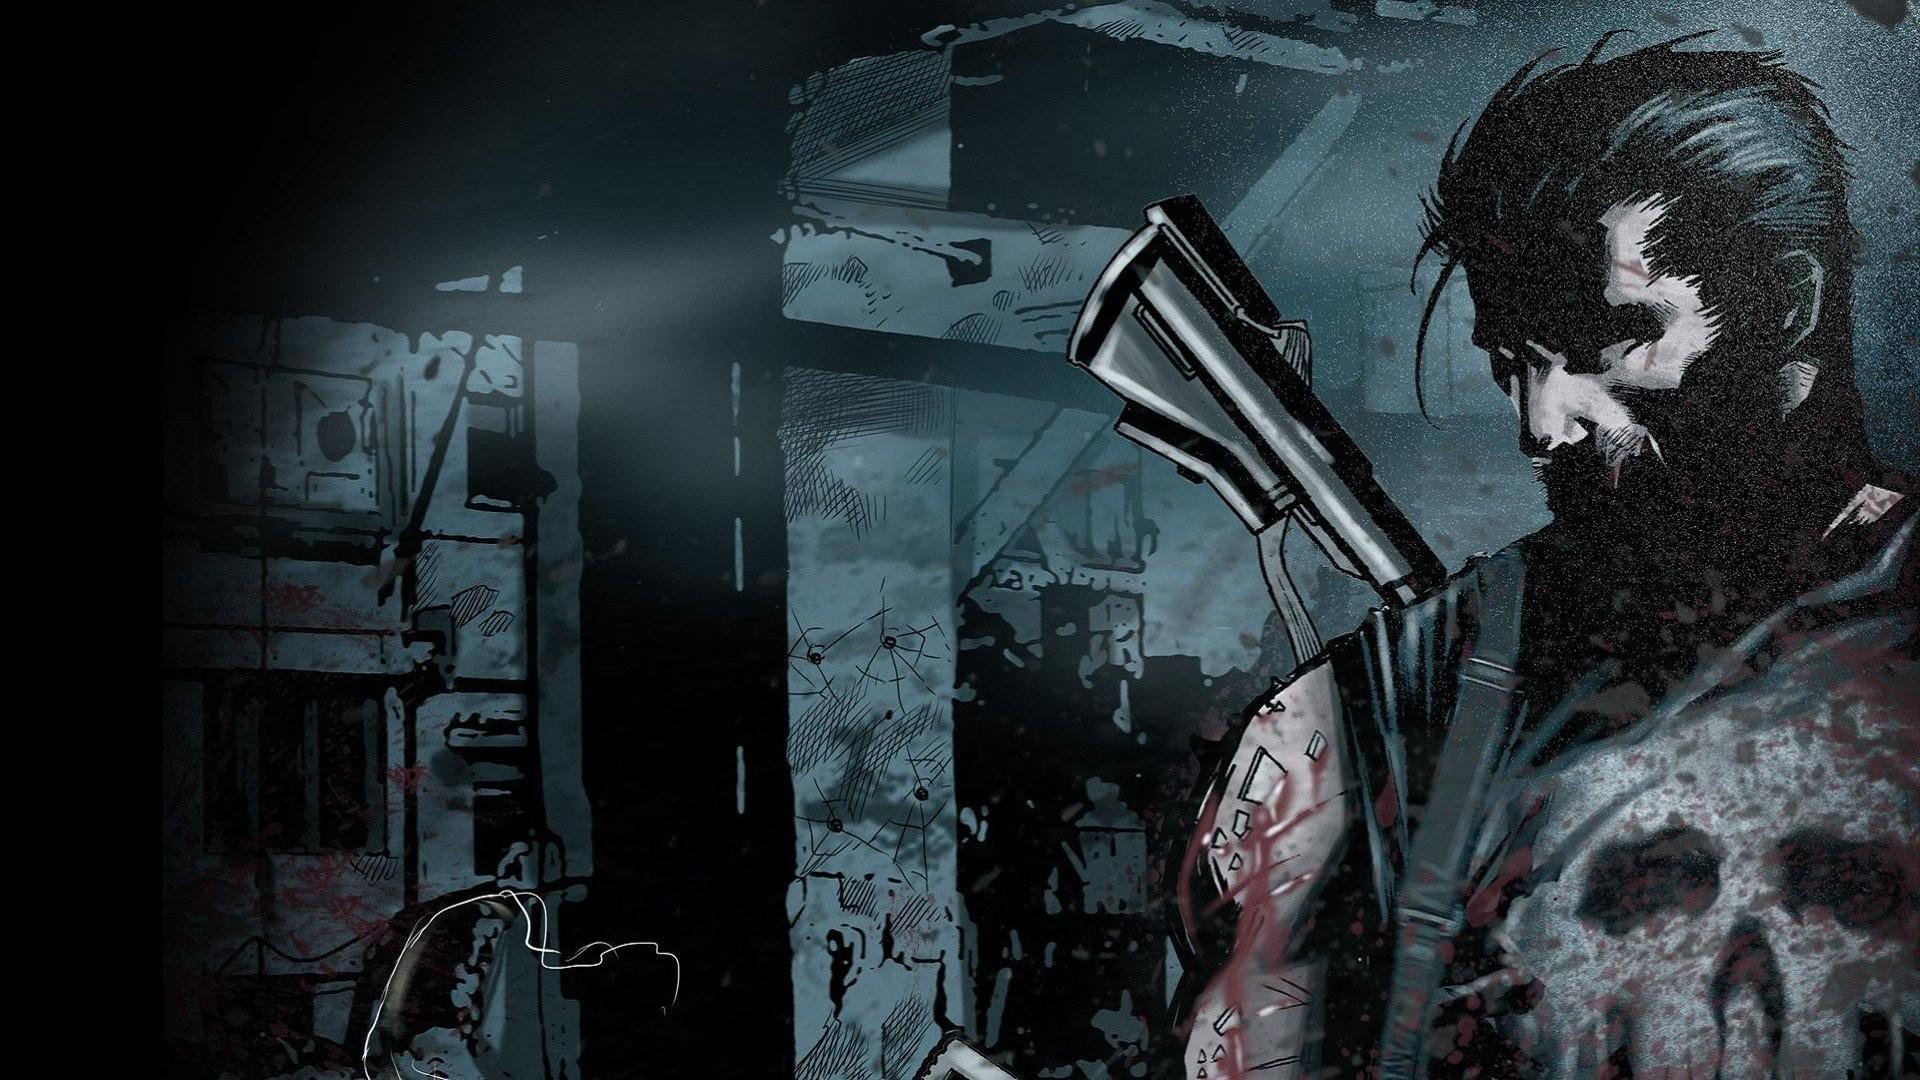 Skulls Black Guns Comics Blood Punisher Wallpaper At Dark Wallpapers